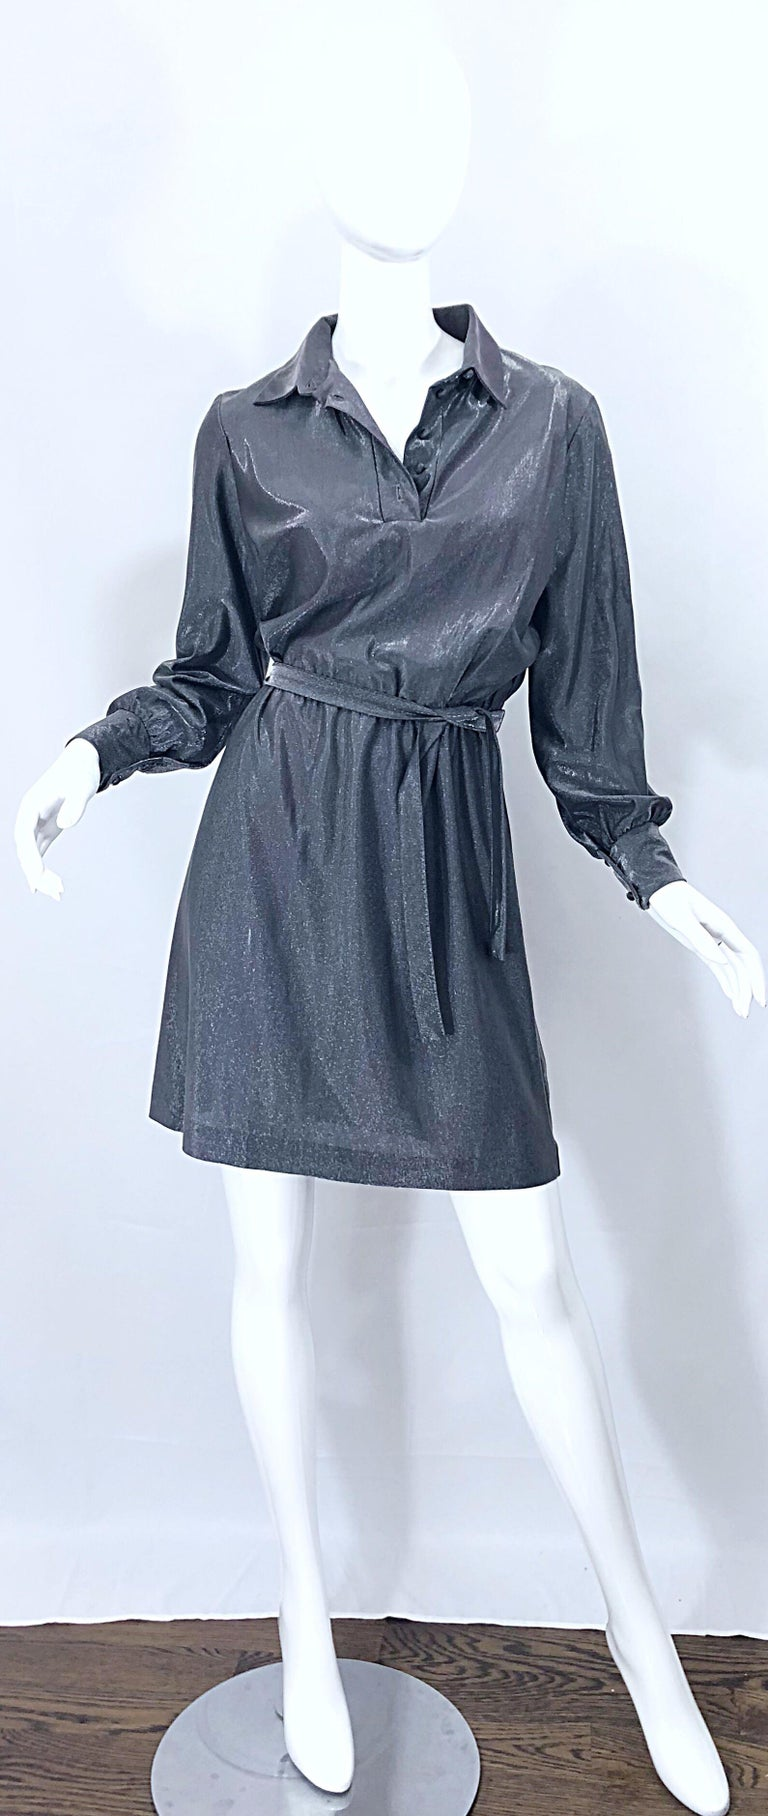 1970s Gunmetal Metallic Silver Gray Belted Vintage 70s Long Sleeve Shirt Dress For Sale 6